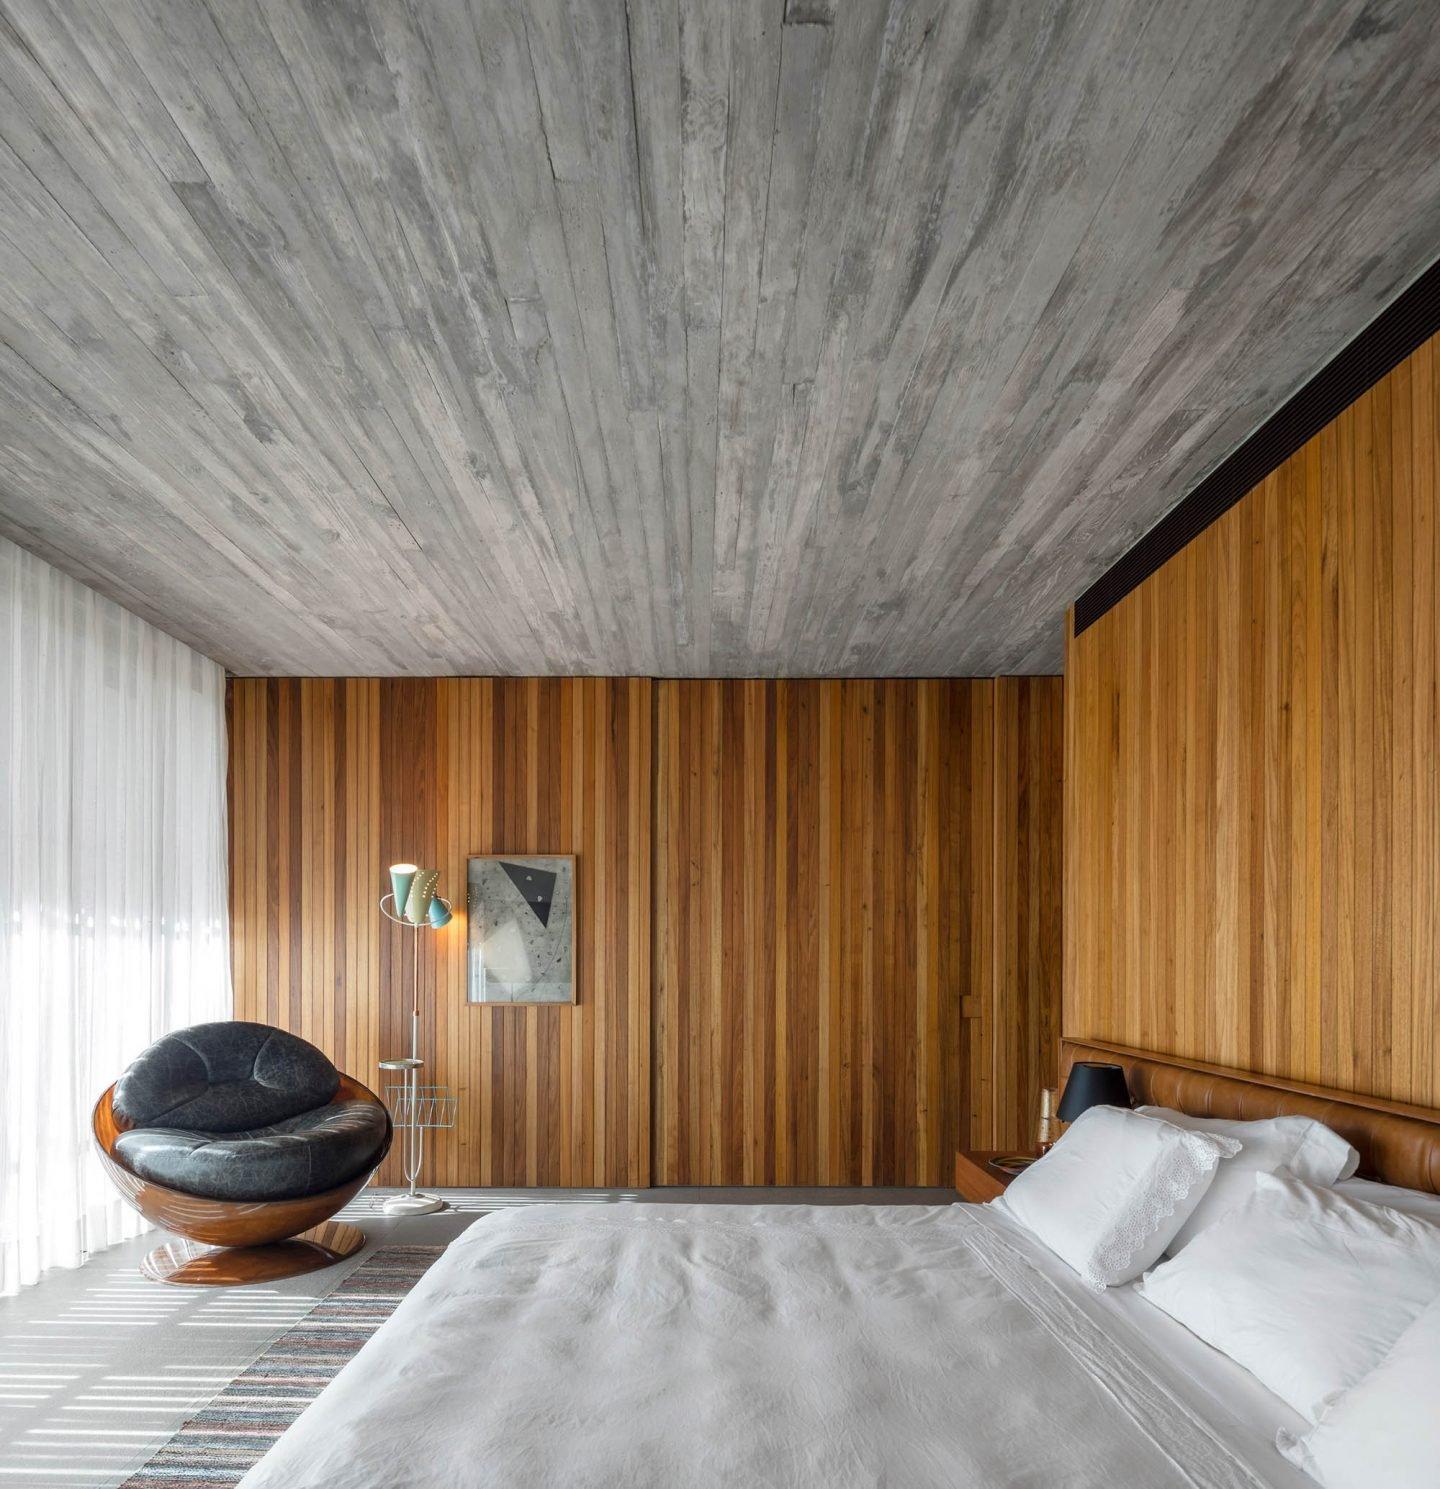 iGNANT-Architecture-Studio-MK27-Planar-House-023